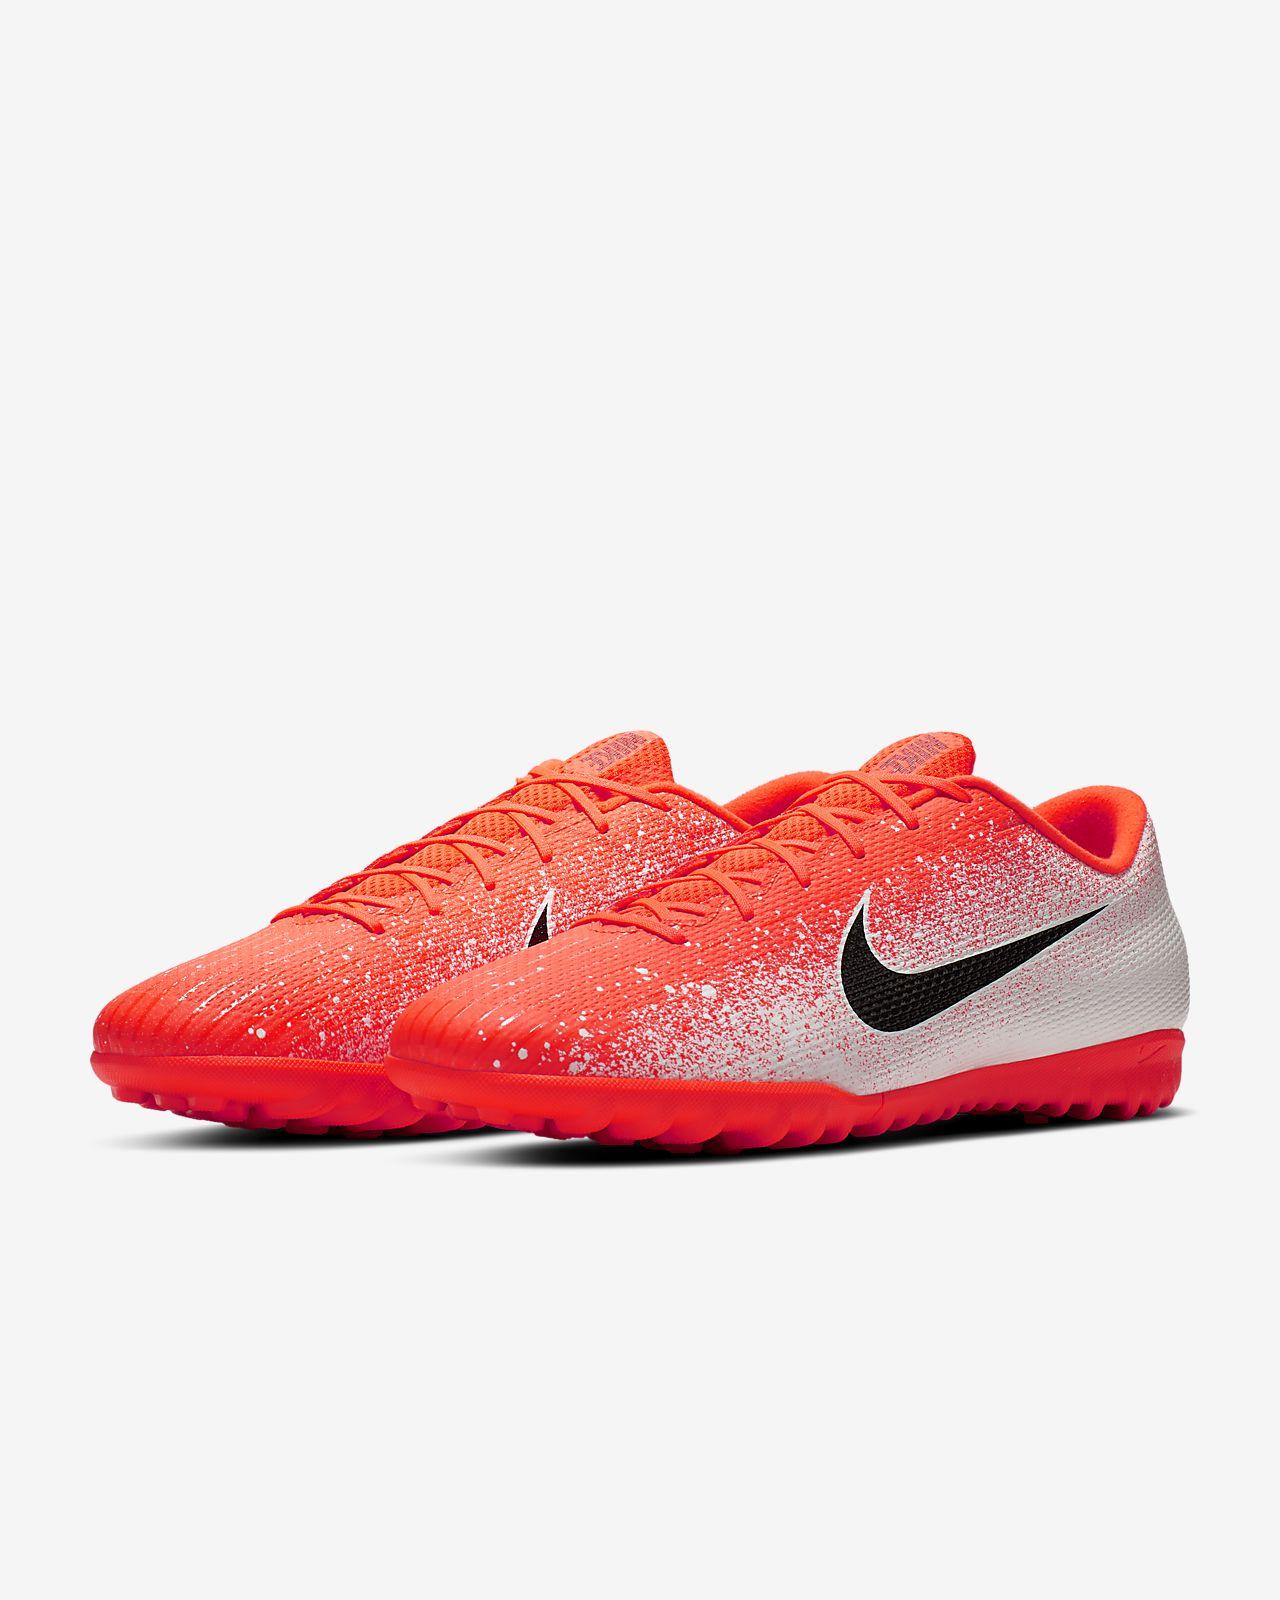 outlet store 9abae 097f6 Nike VaporX 12 Academy TF fotballsko til grus/turf. Nike.com NO